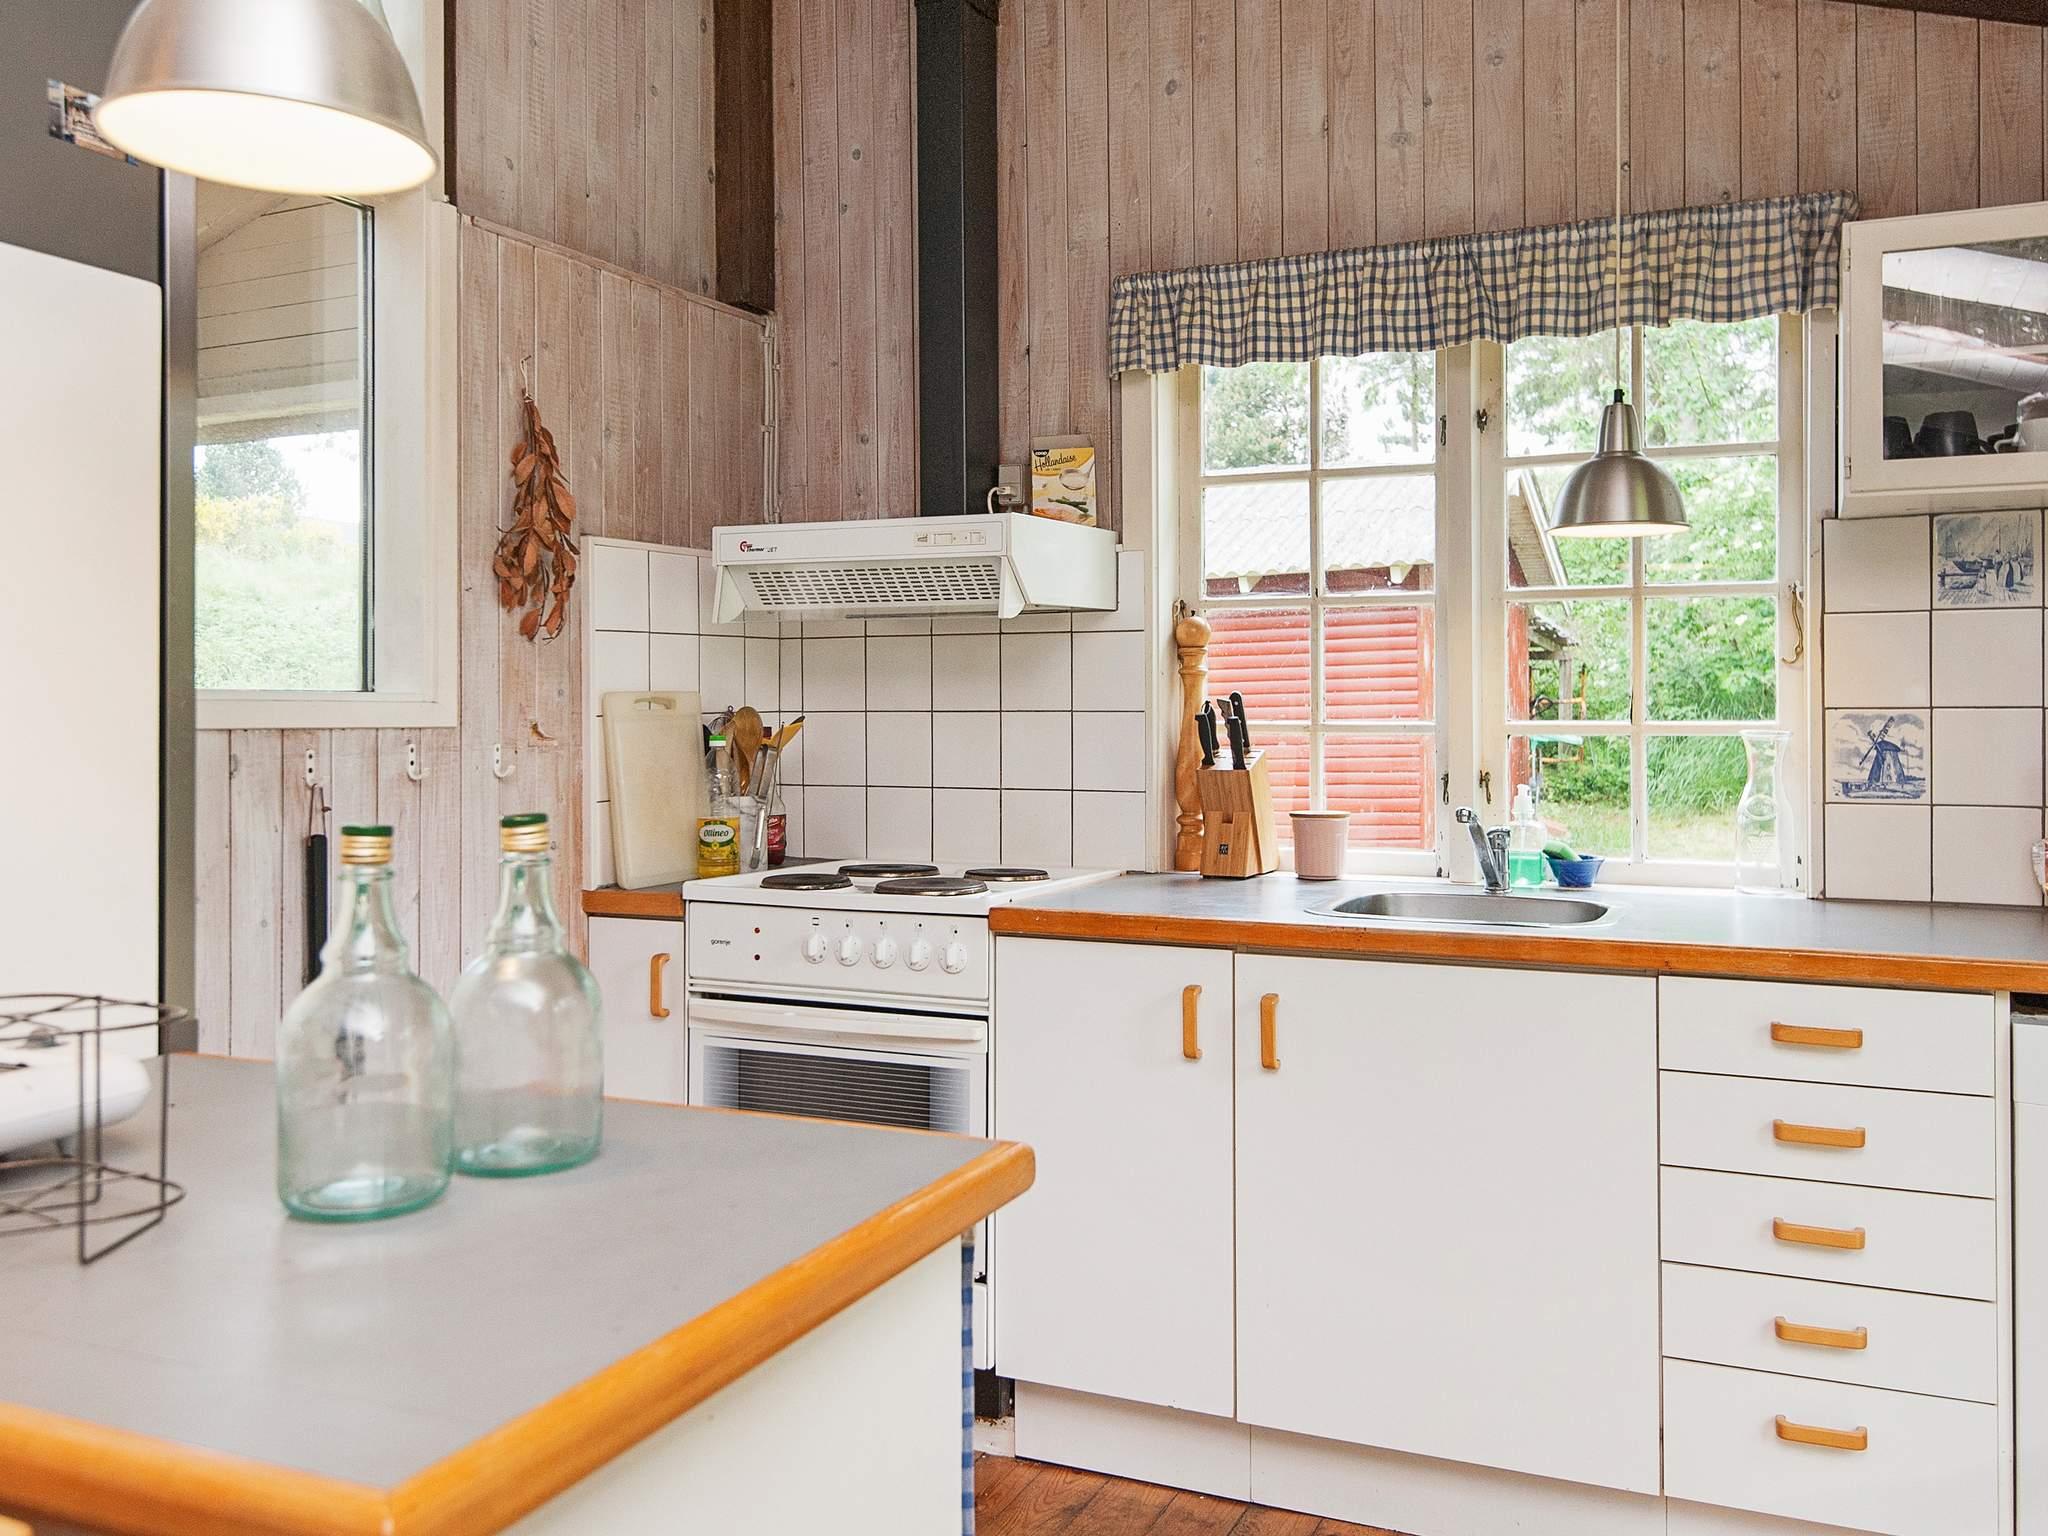 Maison de vacances Helgenæs (2354348), Knebel, , Mer Baltique danoise, Danemark, image 6